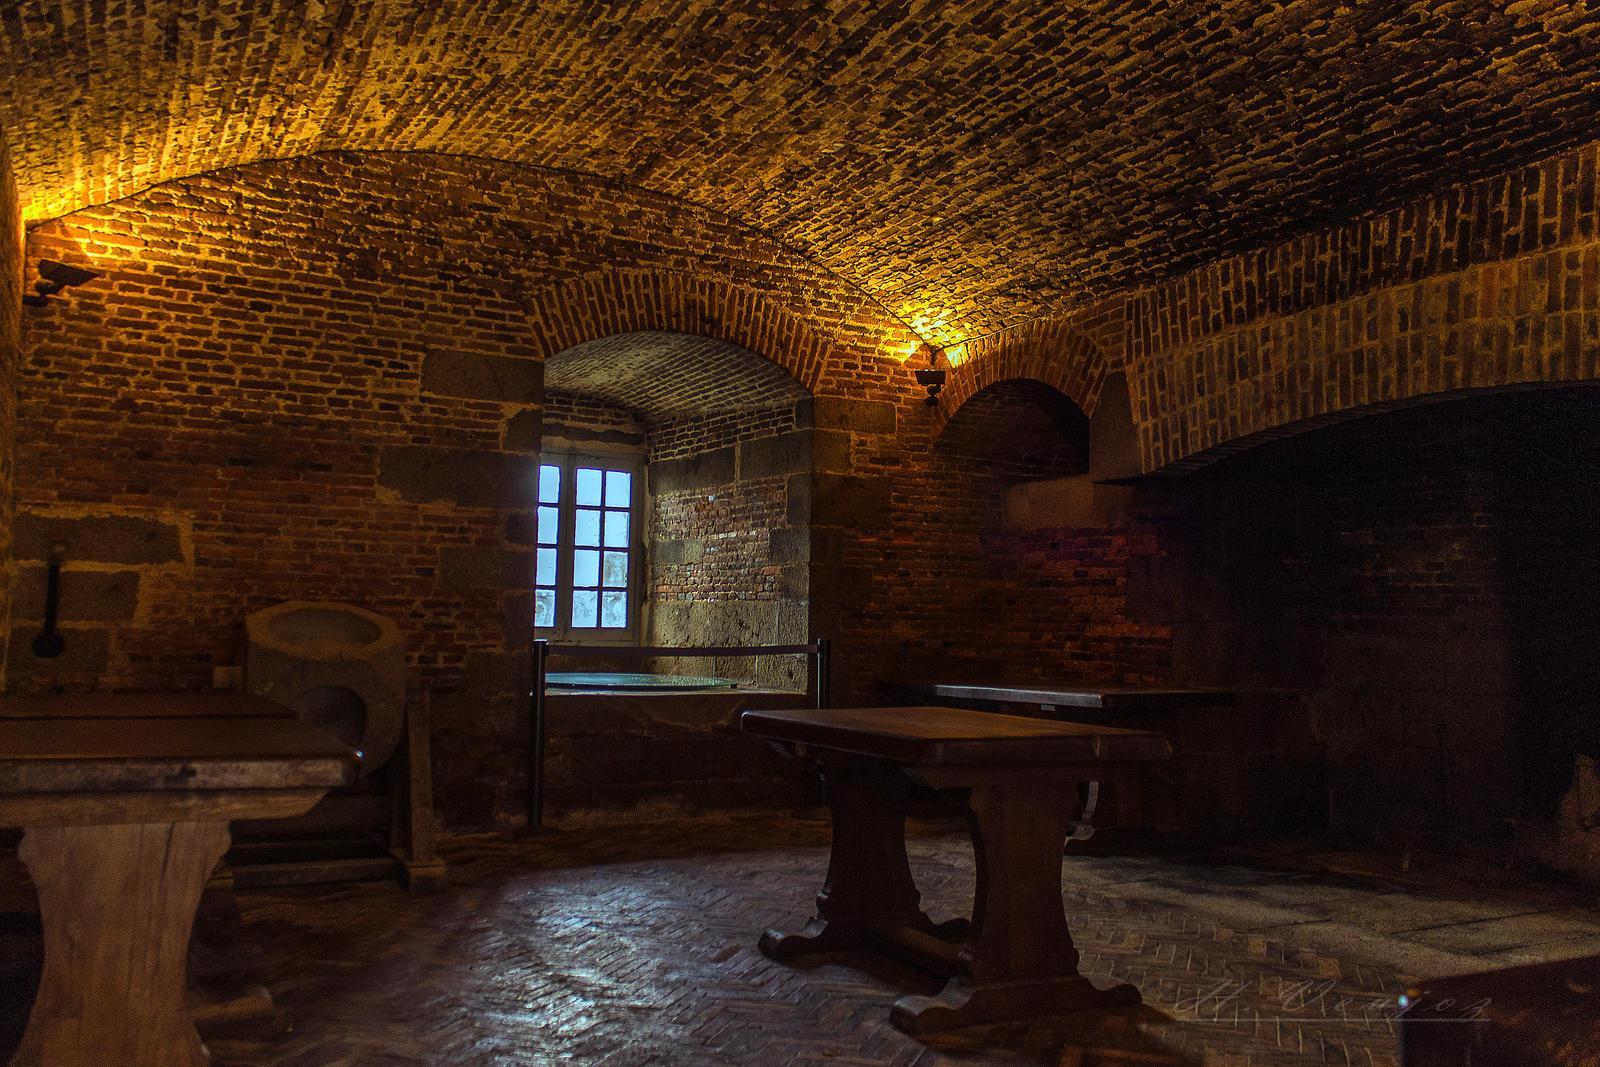 Room Chateau De Carrouge Orne France by hubert61